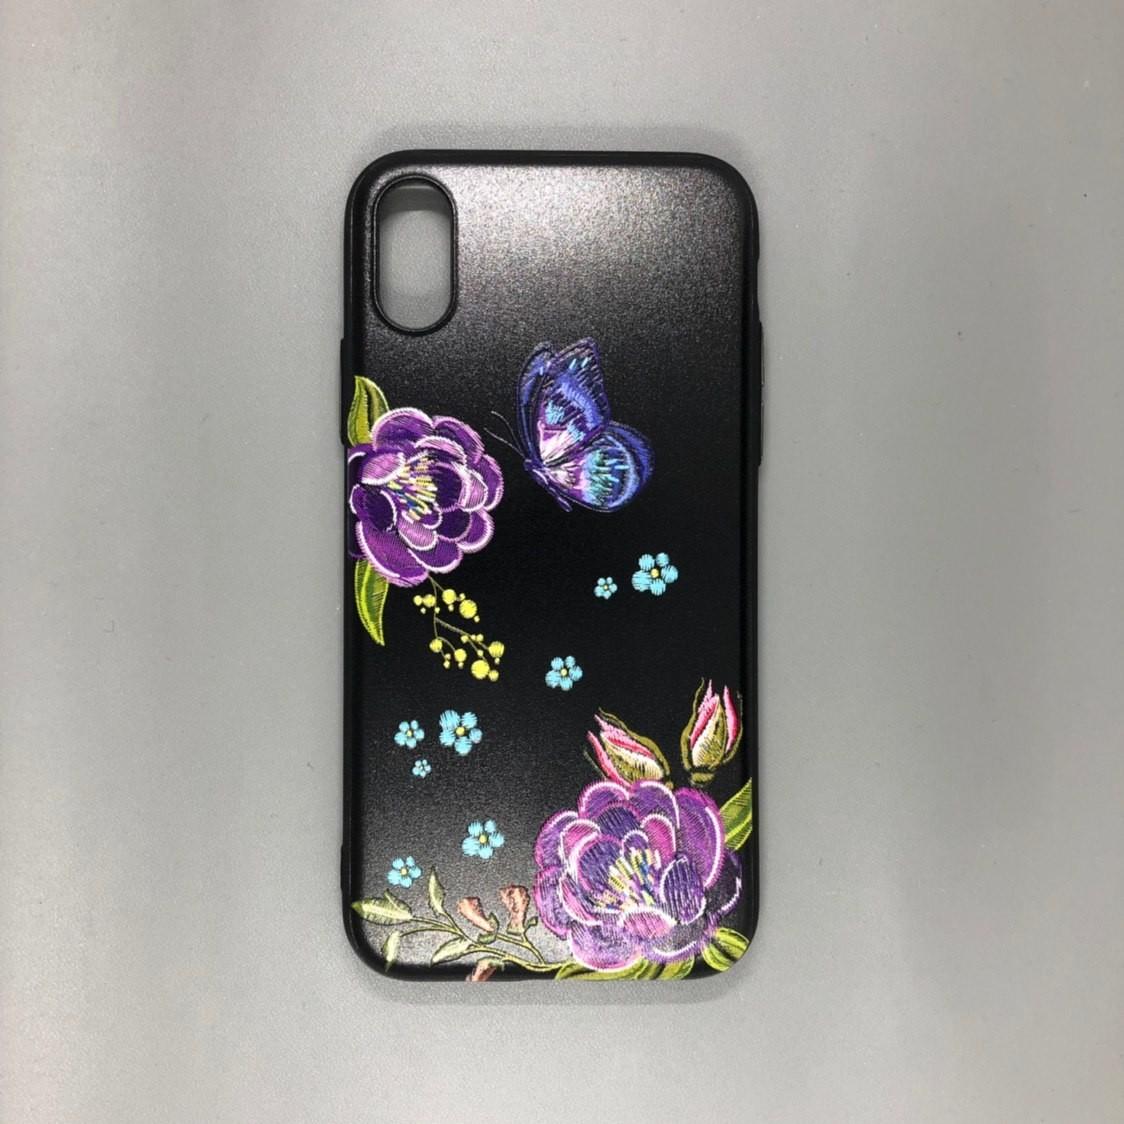 iPhone X Flowers